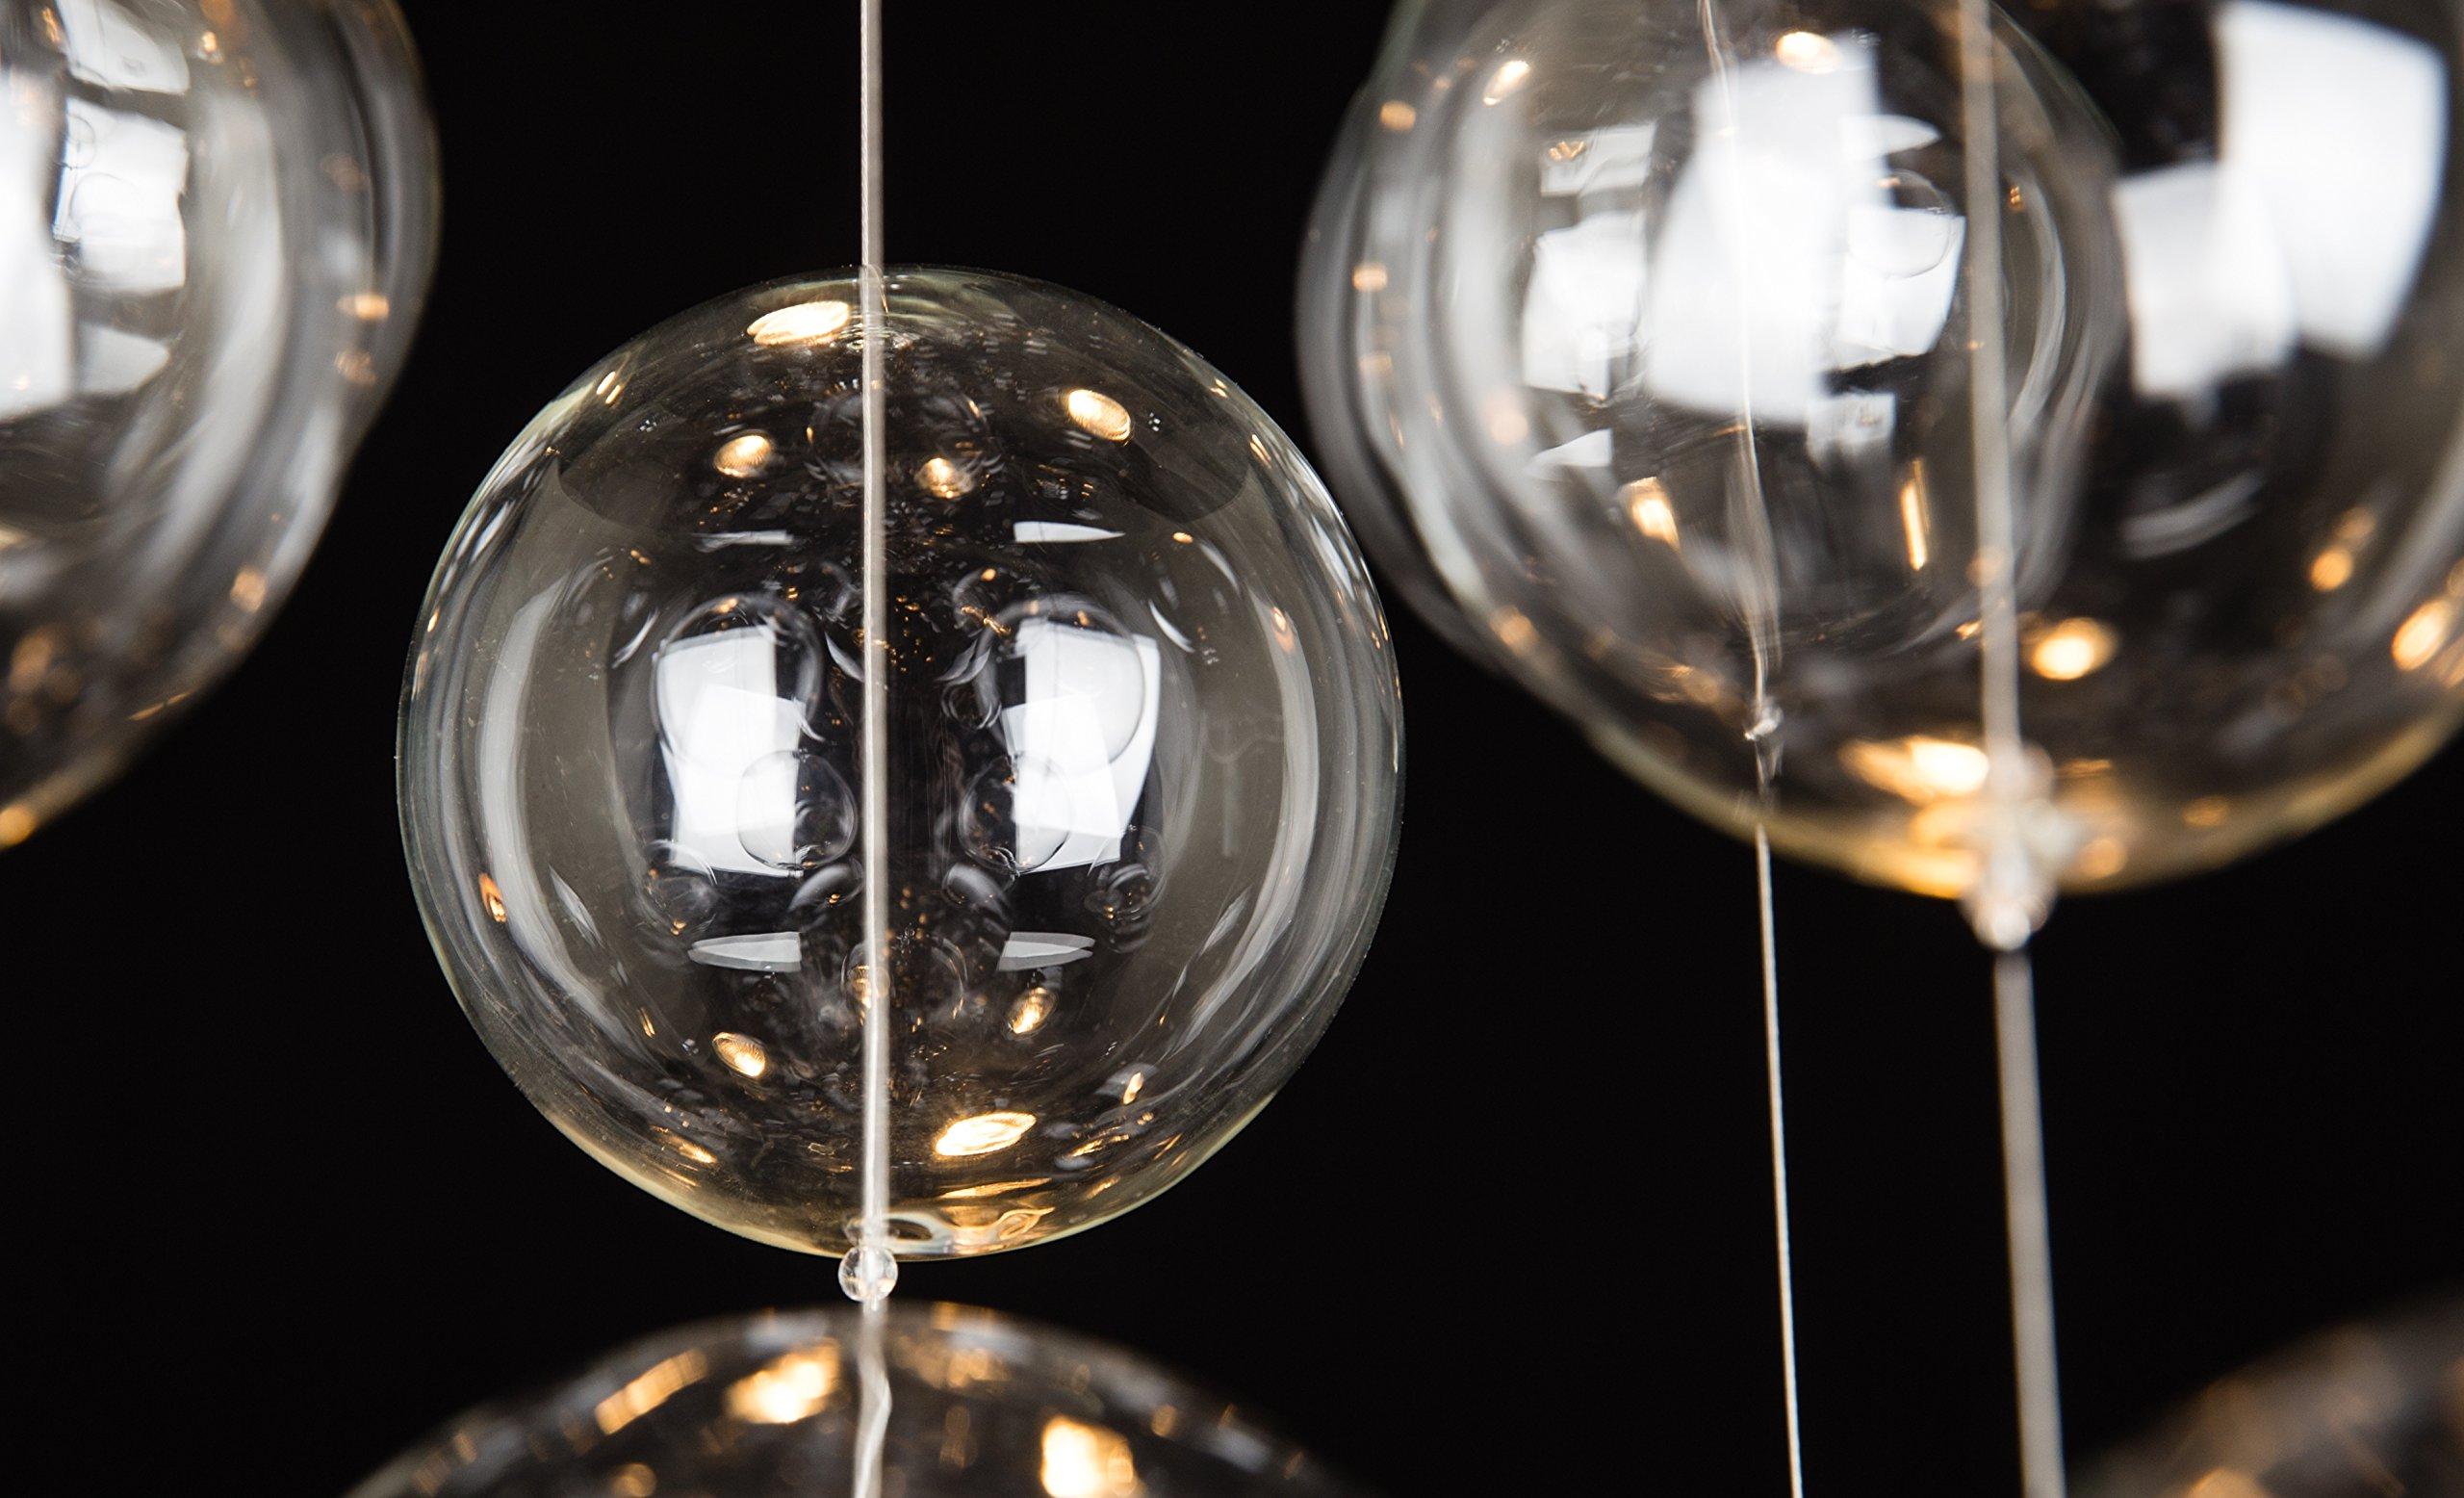 Saint Mossi Modern Glass Raindrop Chandelier Lighting Flush mount LED Ceiling Light Fixture Pendant Lamp for Dining Room Bathroom Bedroom Livingroom 4 GU10 Bulbs Required H31'' X D20''